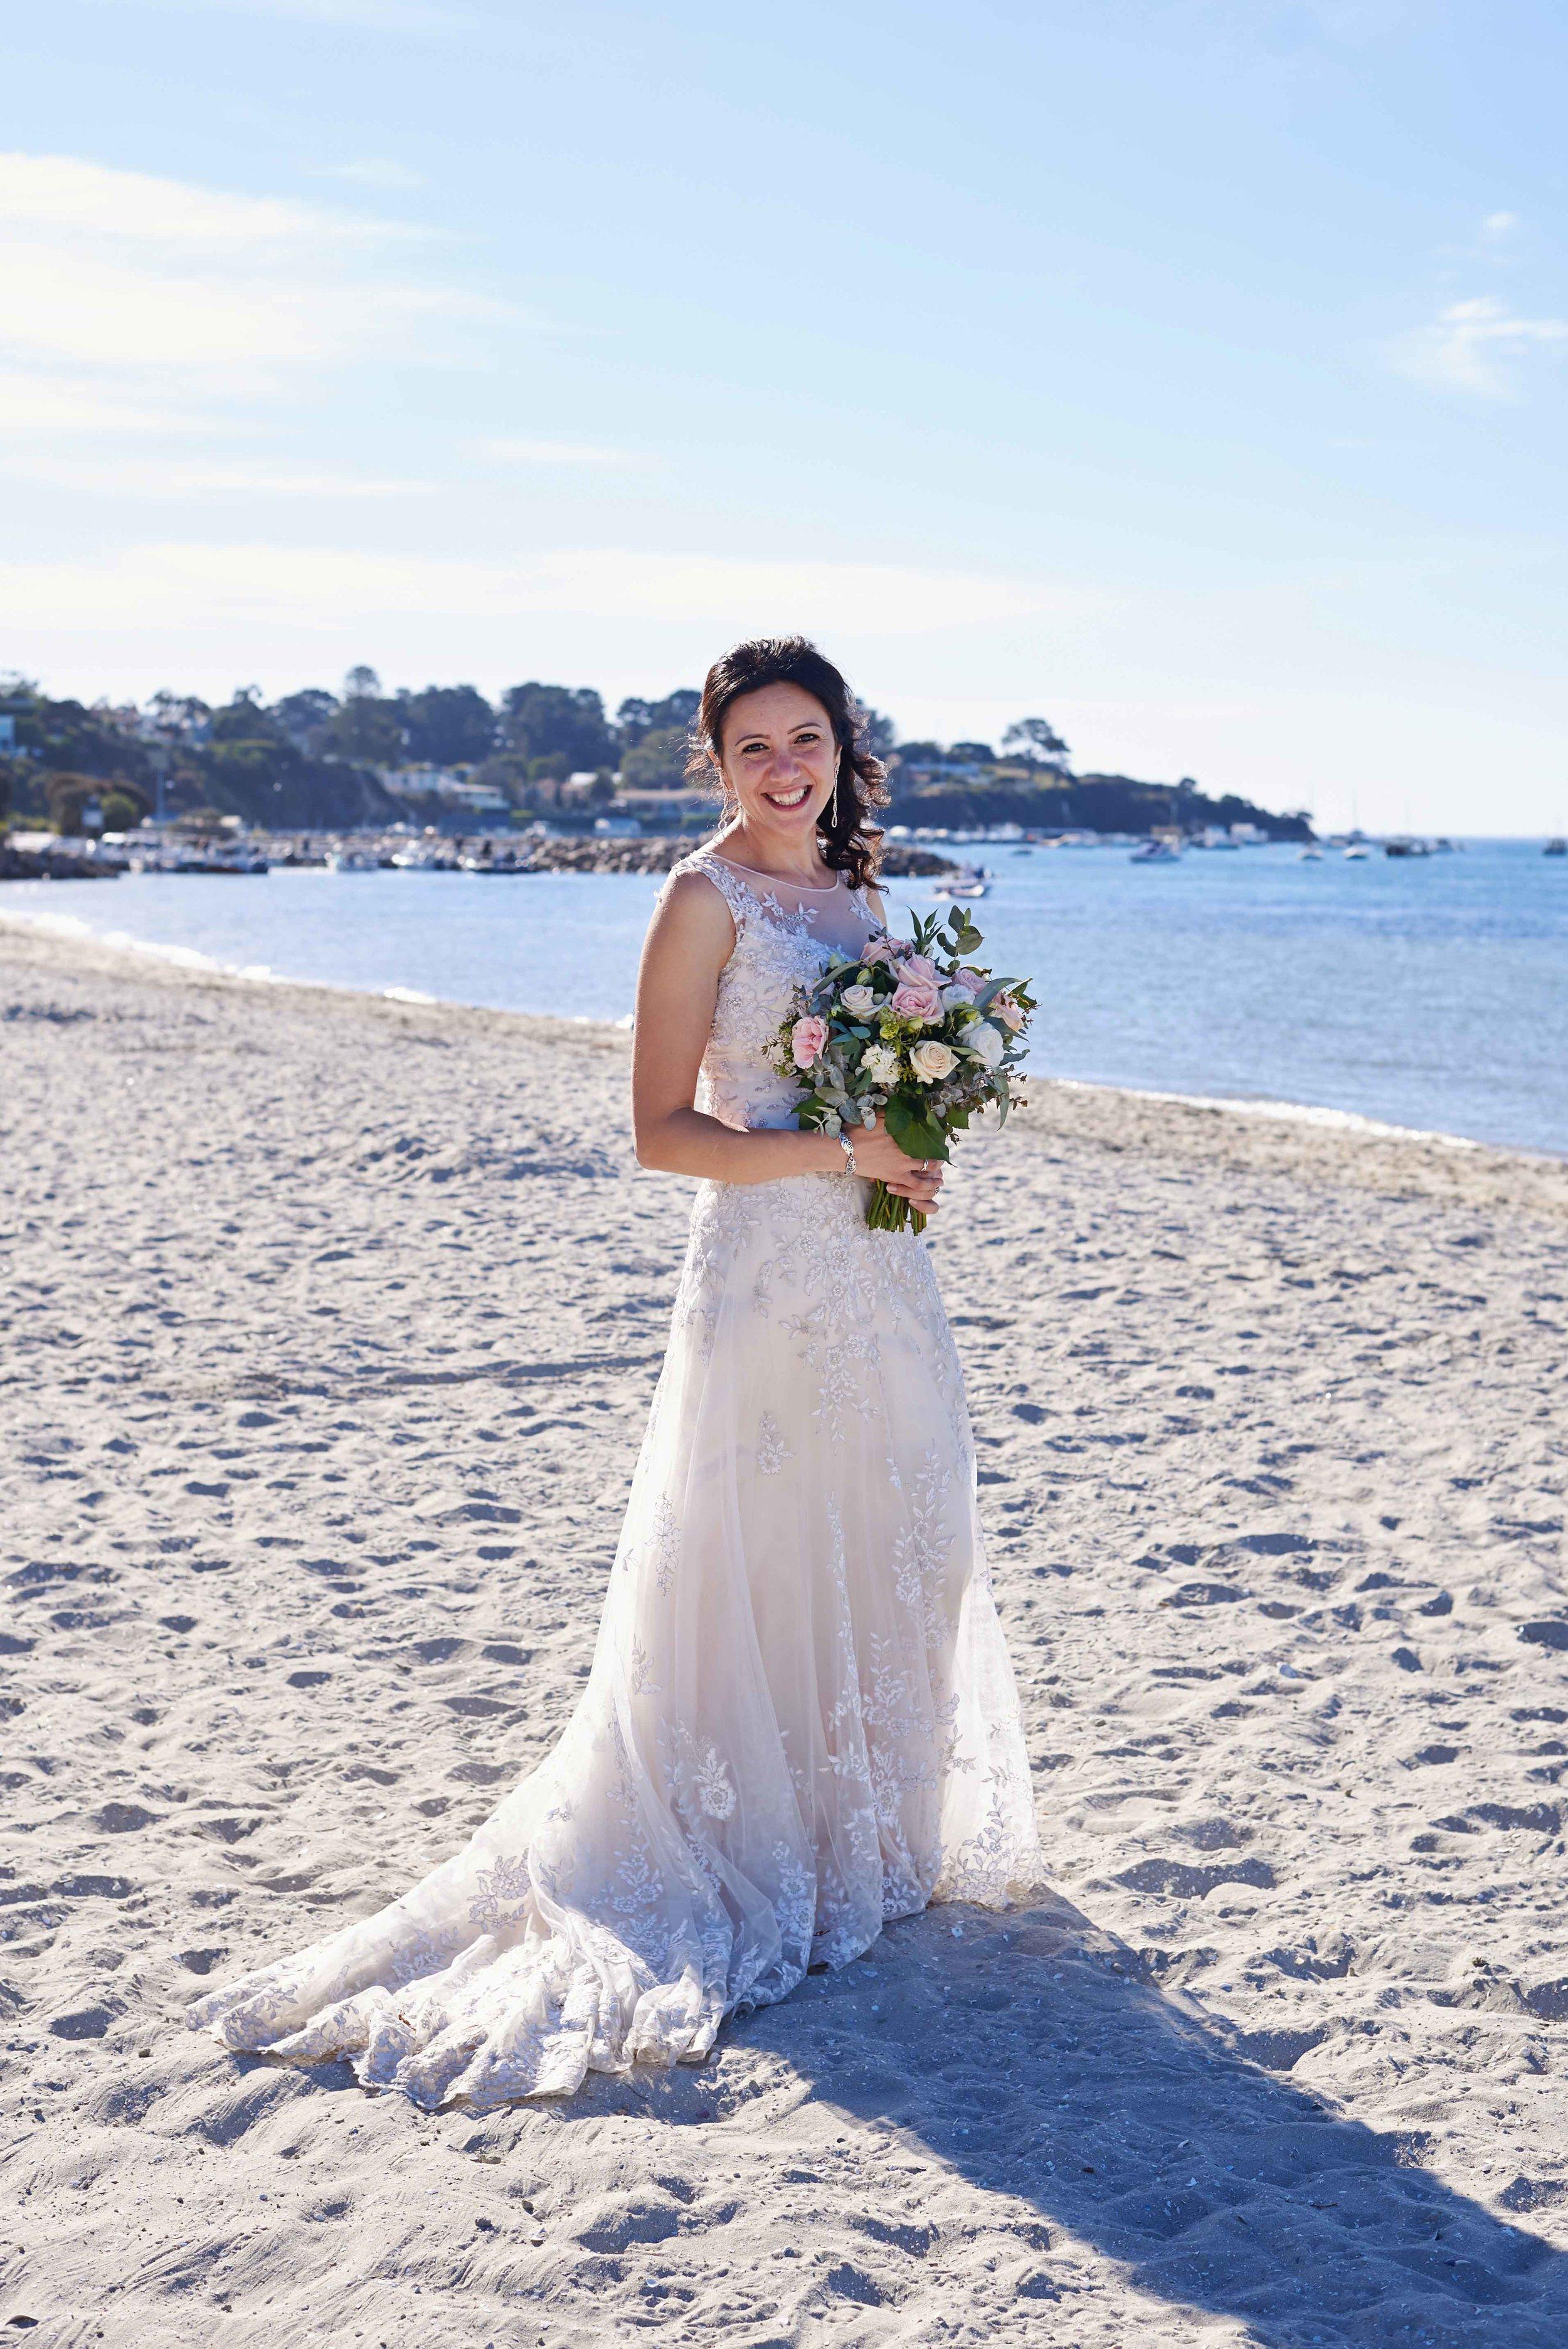 sorrento-wedding-photography-all-smiles-marissa-jade-photography-158.jpg